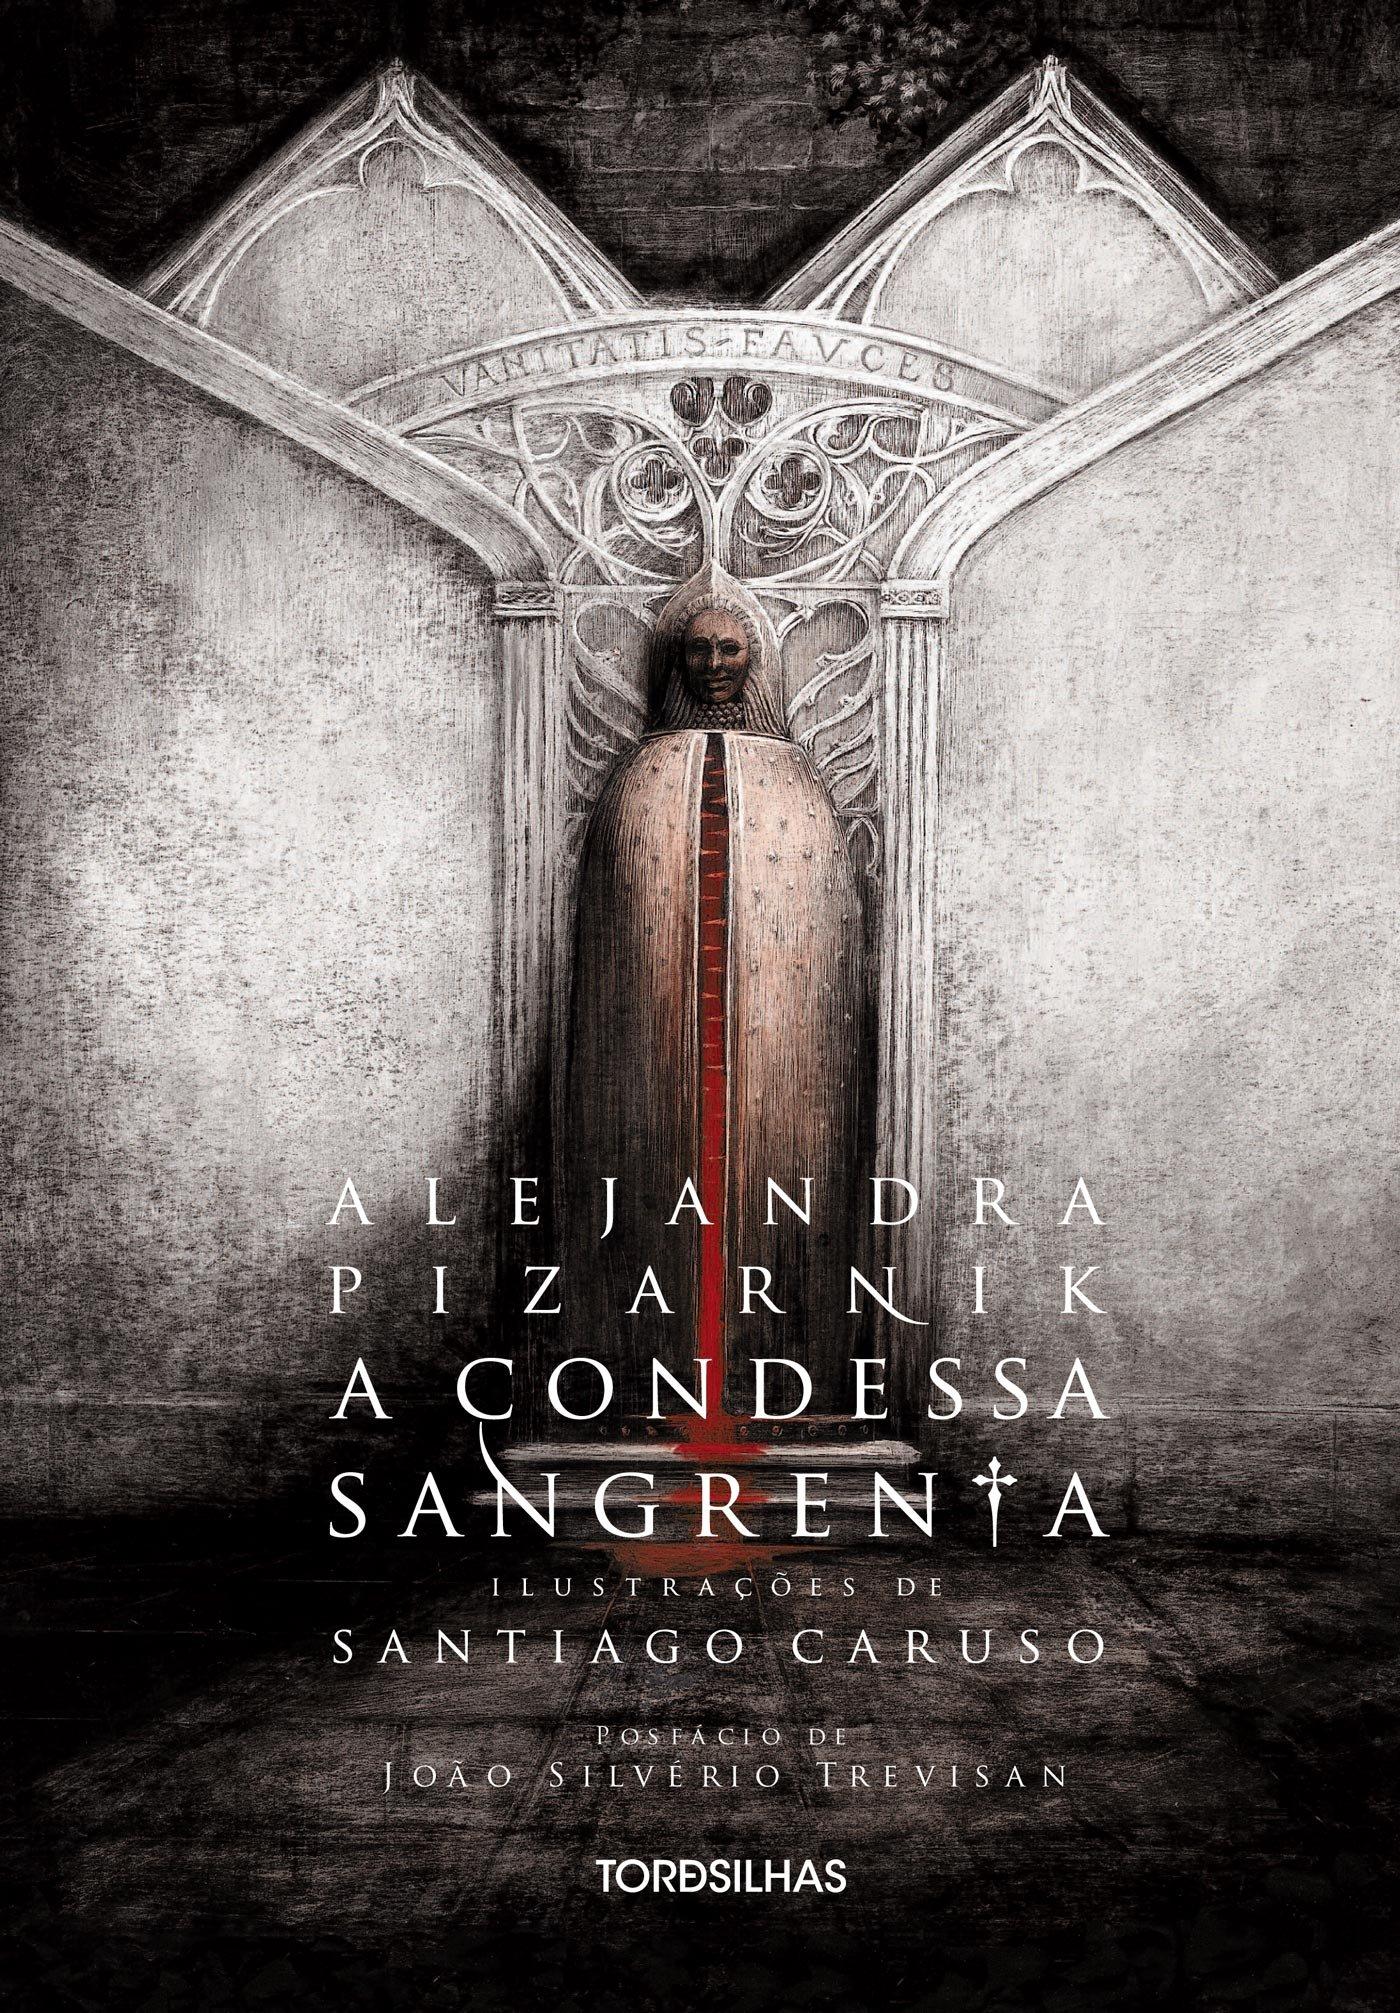 A condessa sangrenta | Amazon.com.br